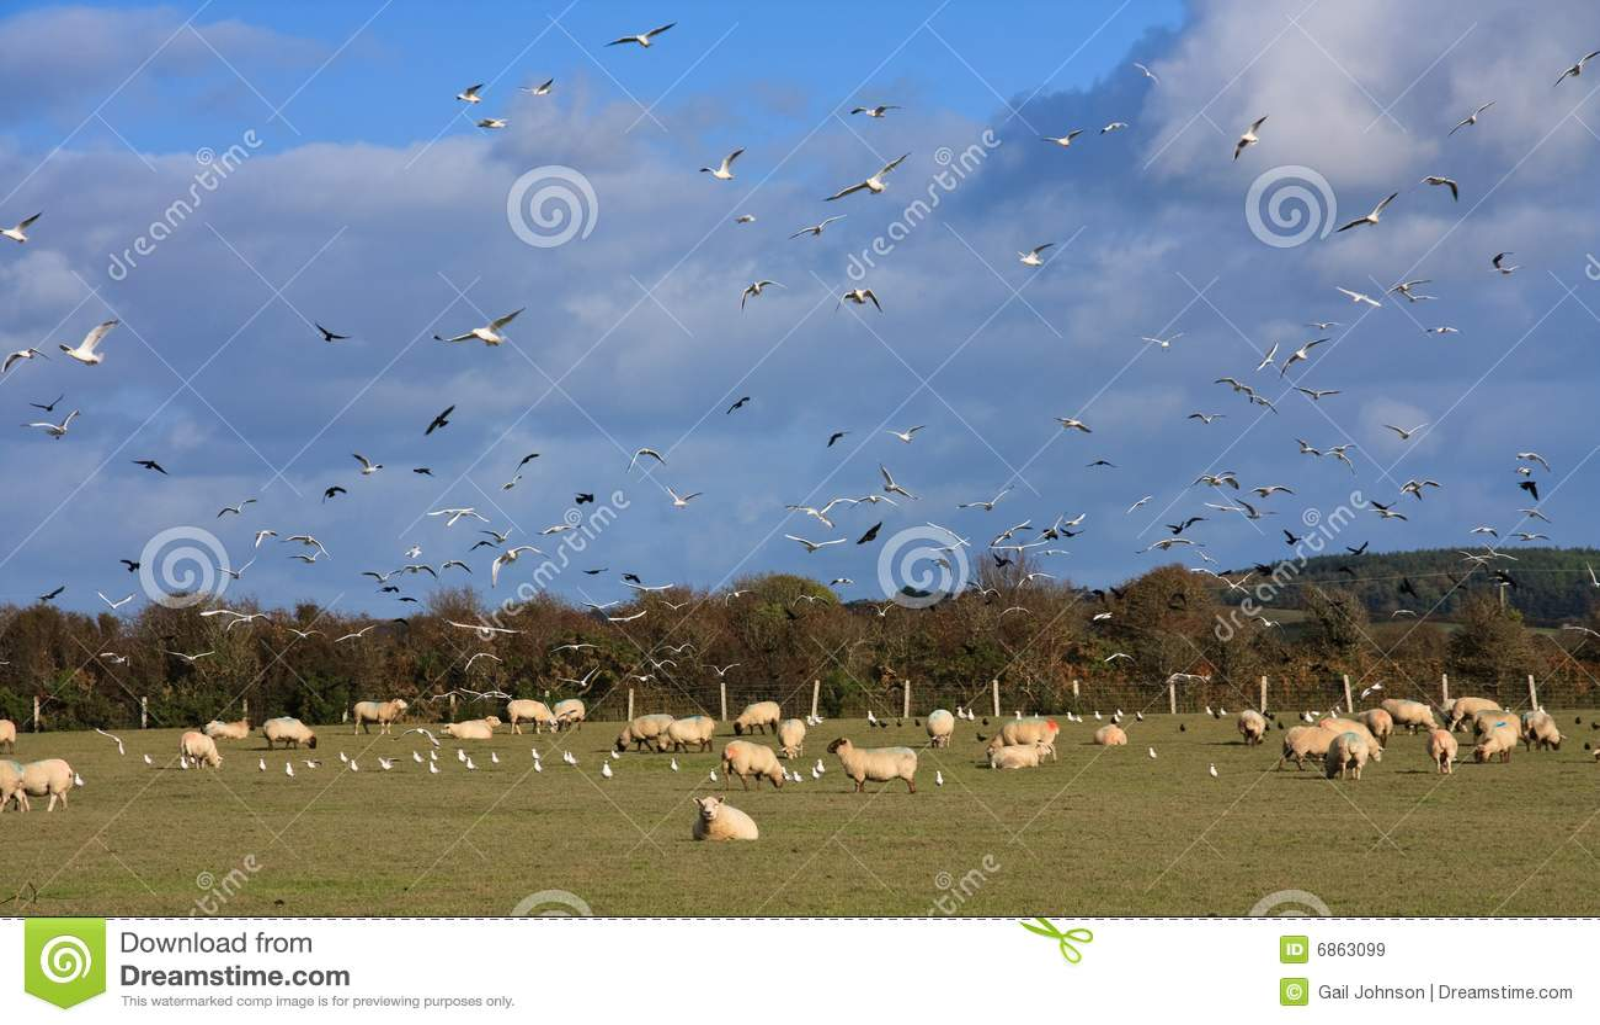 птицы field полные овцы